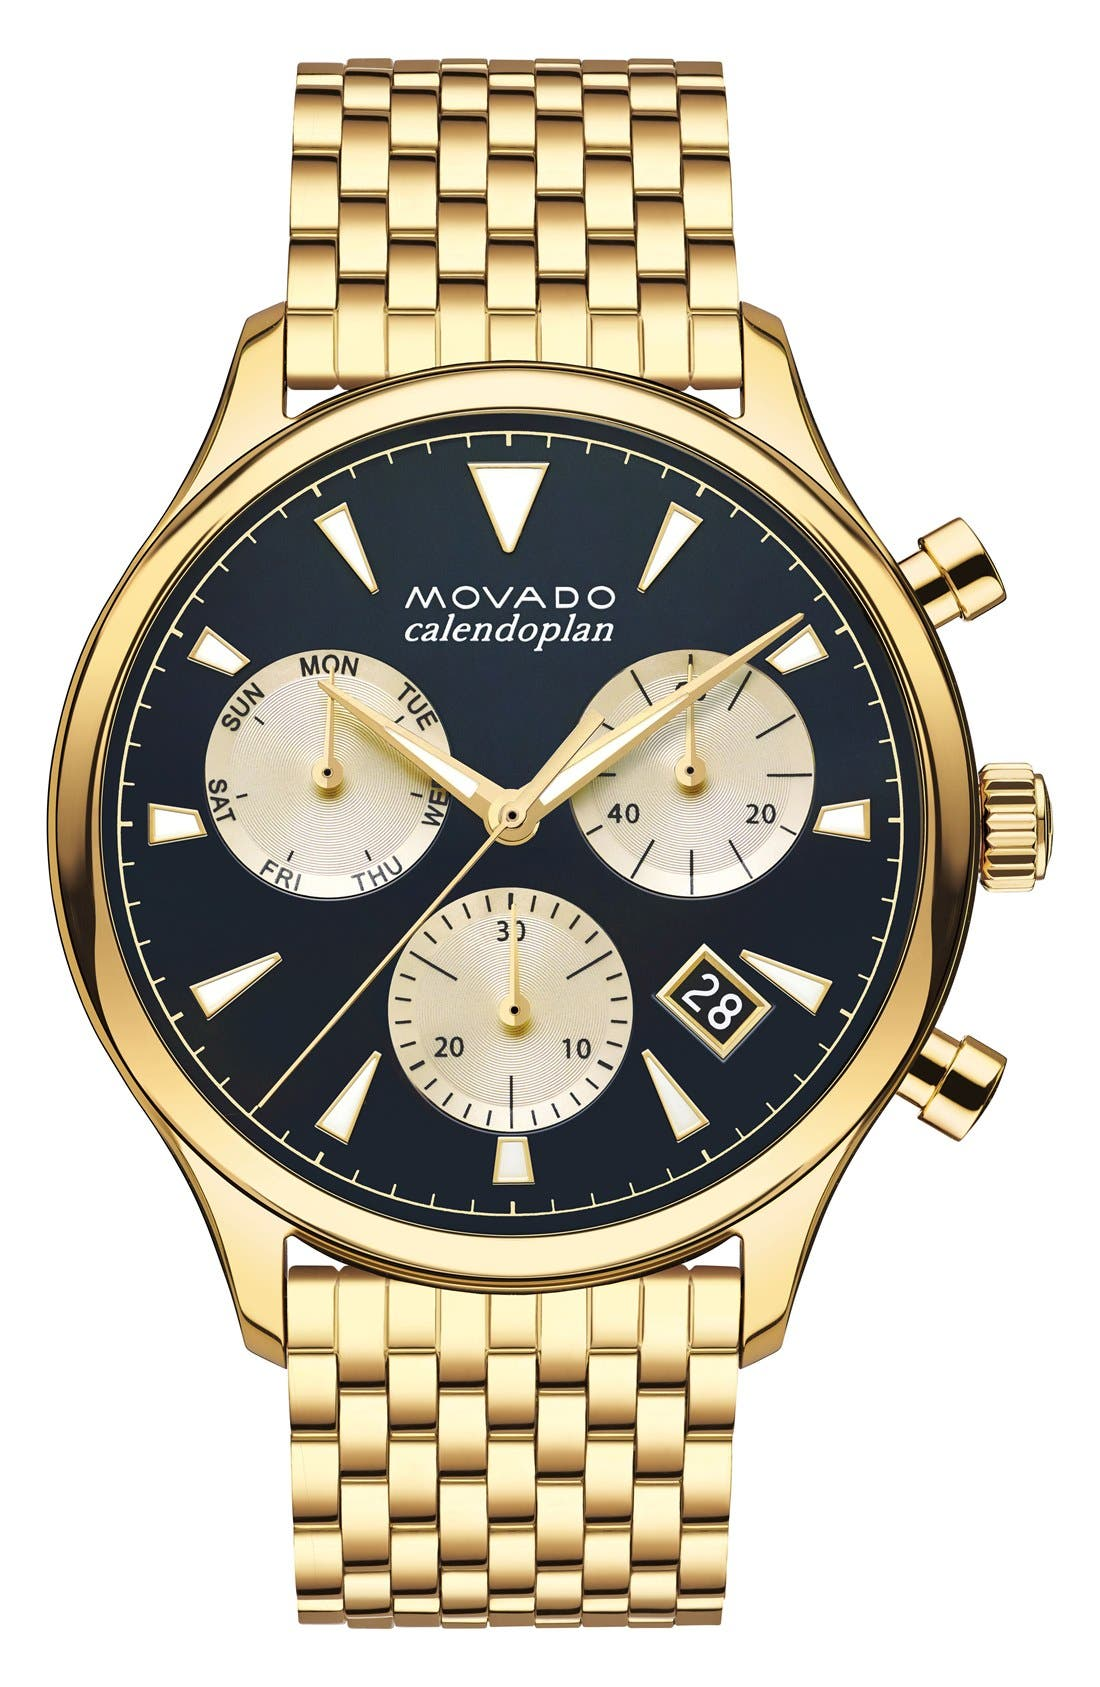 Main Image - Movado Heritage Chronograph Bracelet Watch, 43mm